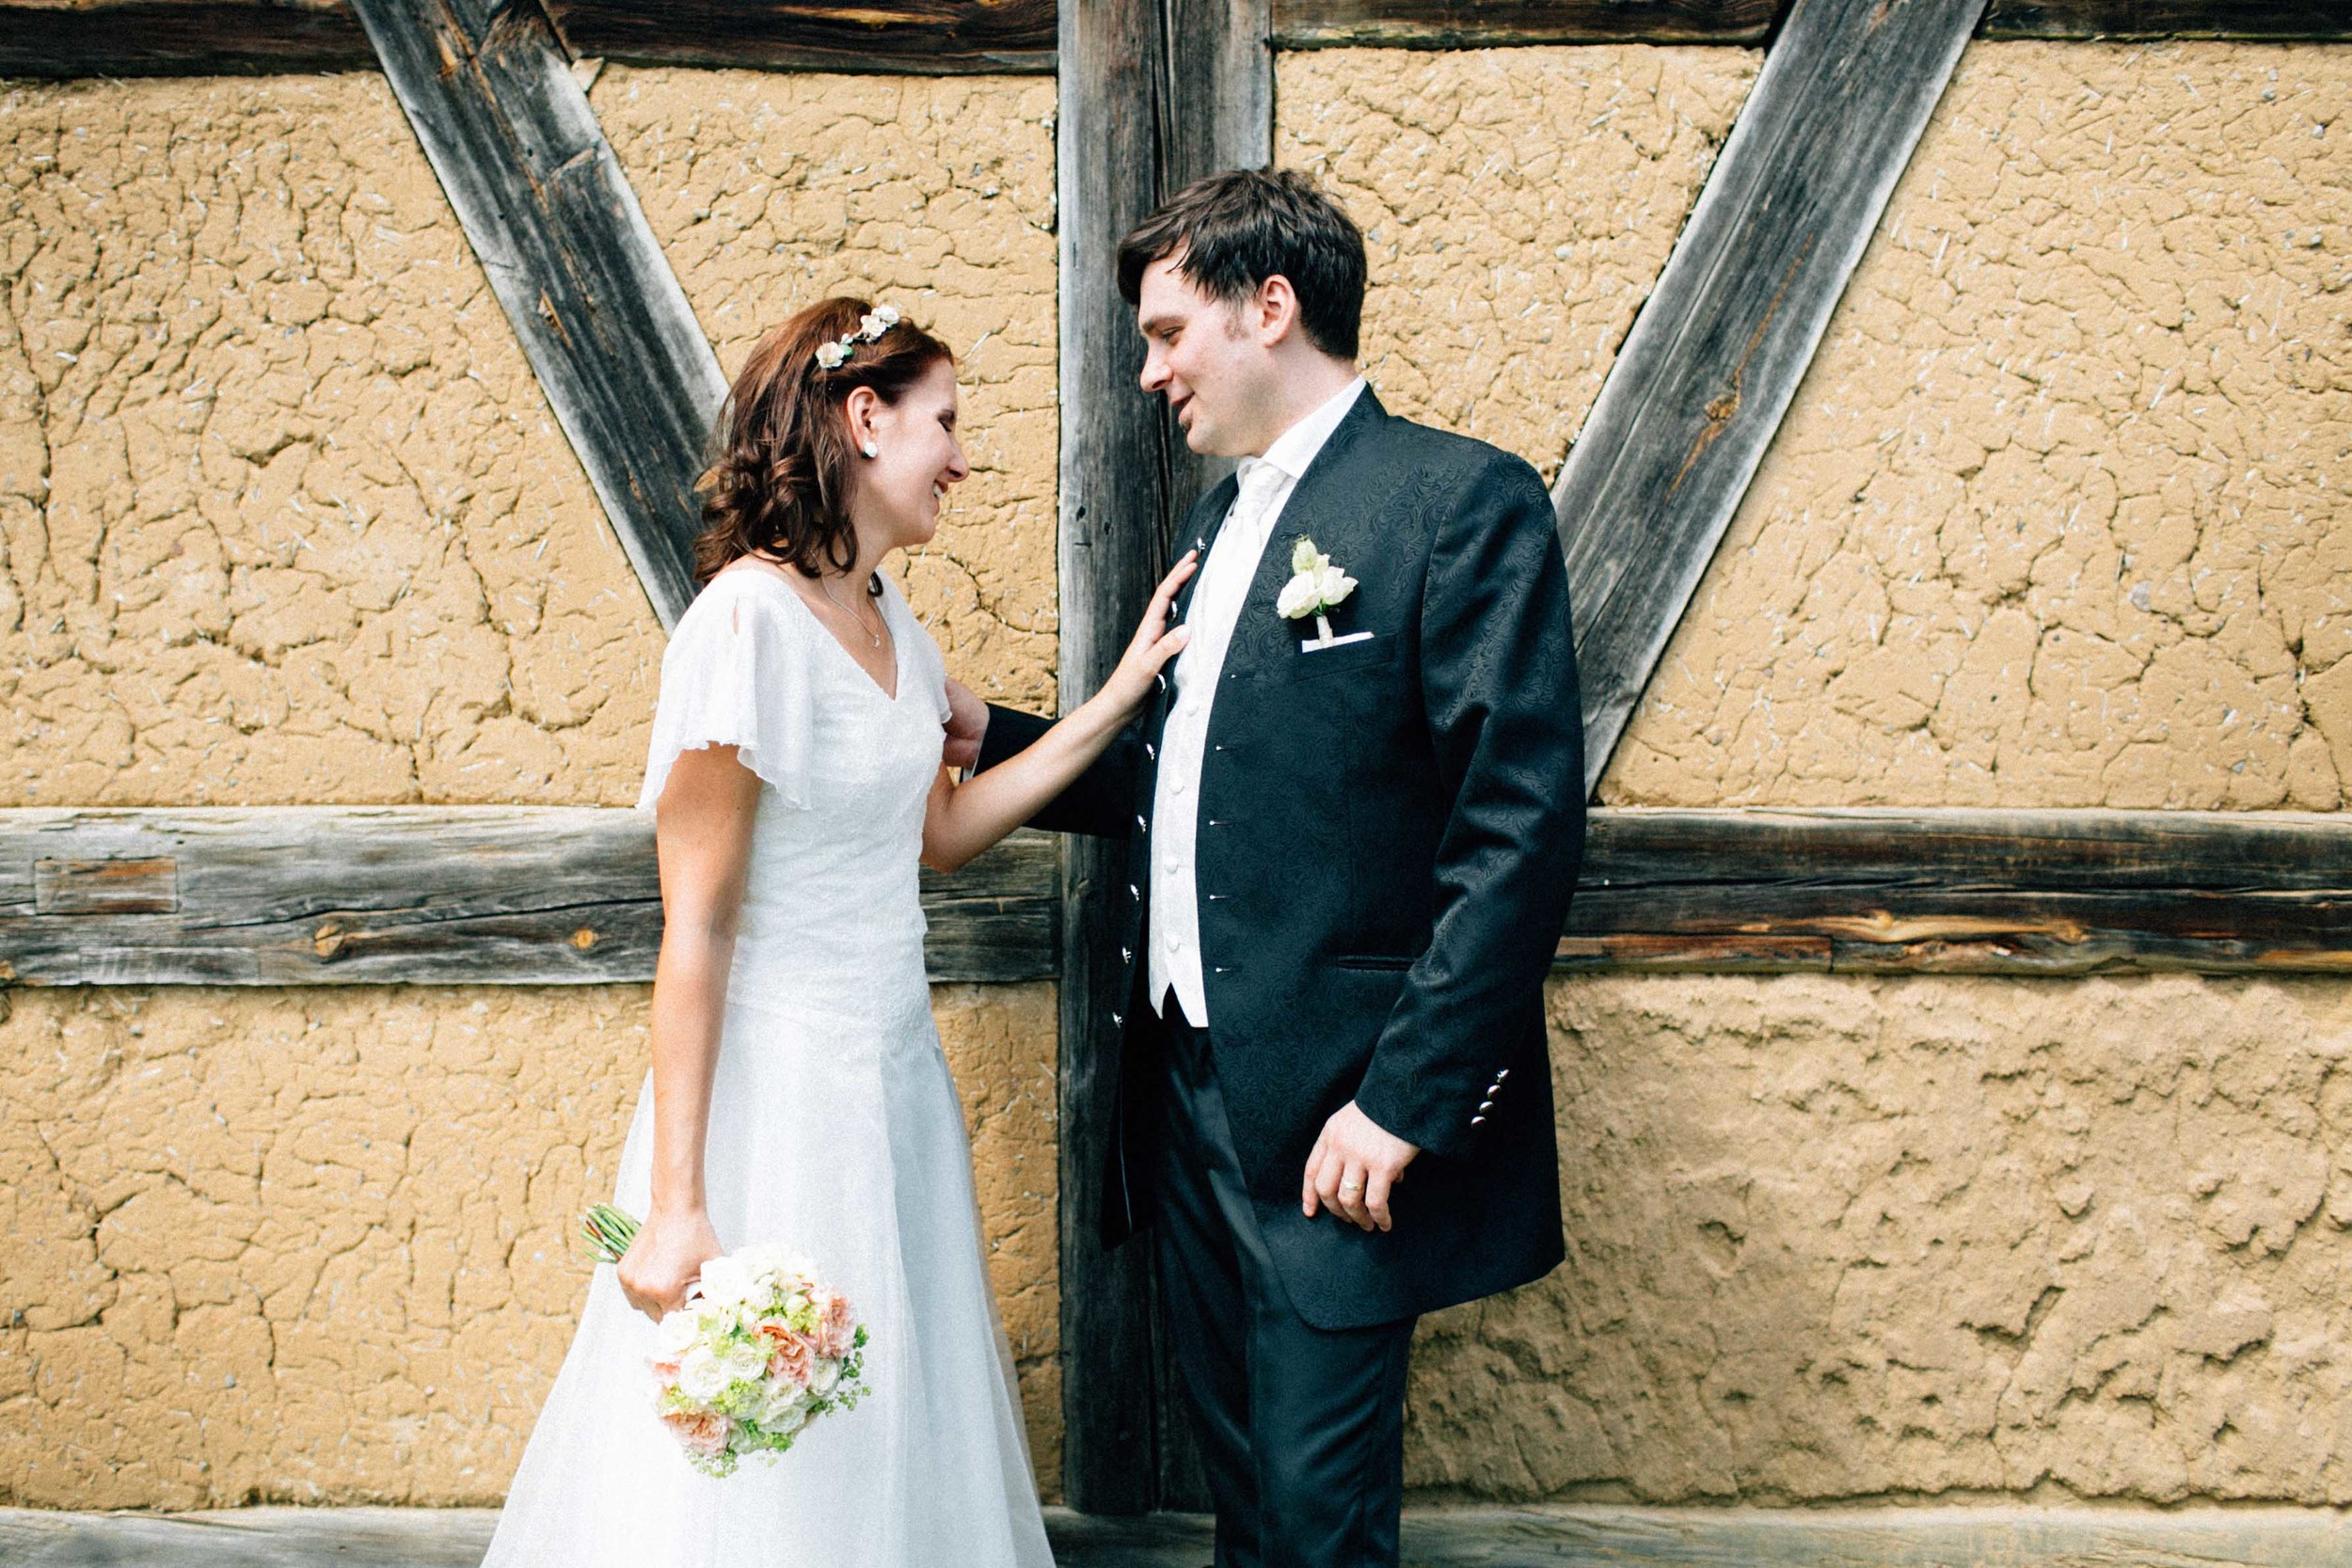 Spreewald Hochzeitsfotografie_Fran Burrows Fotografie-55.jpg